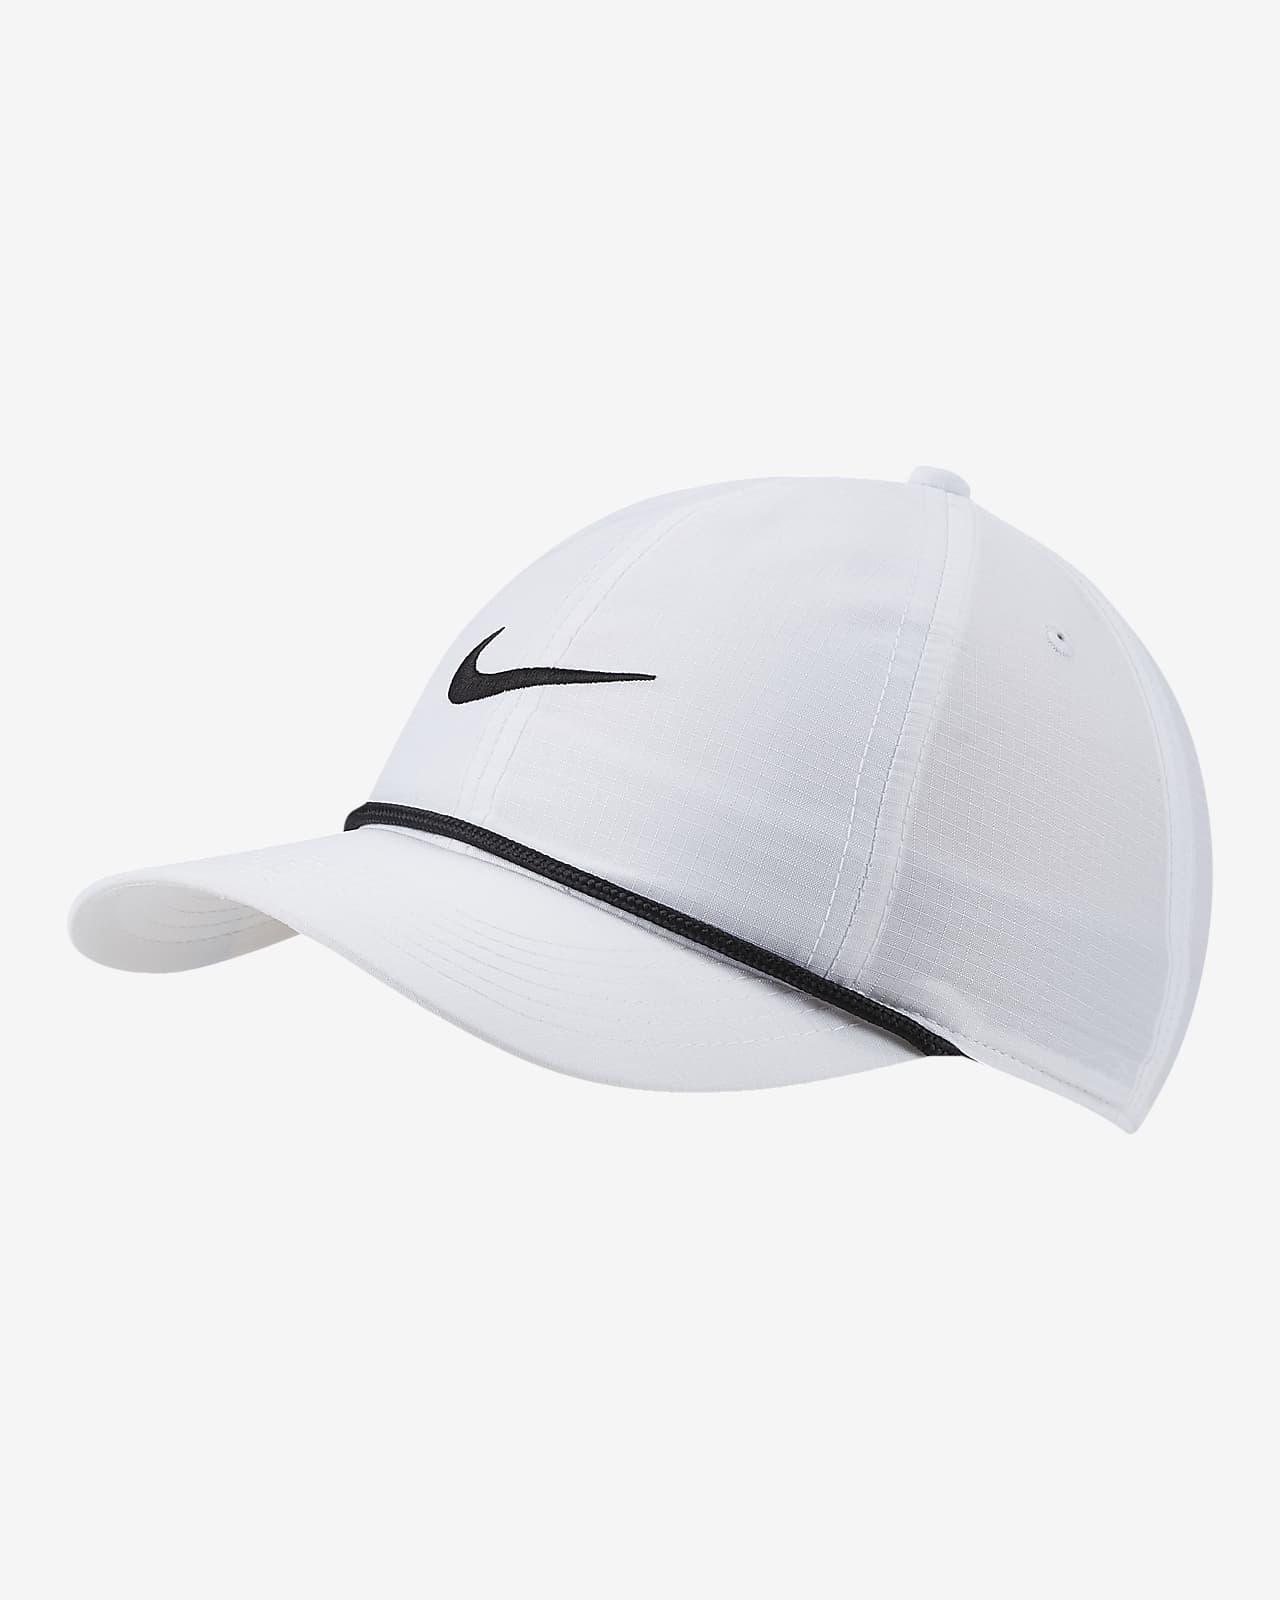 Nike Golf-Cap für ältere Kinder